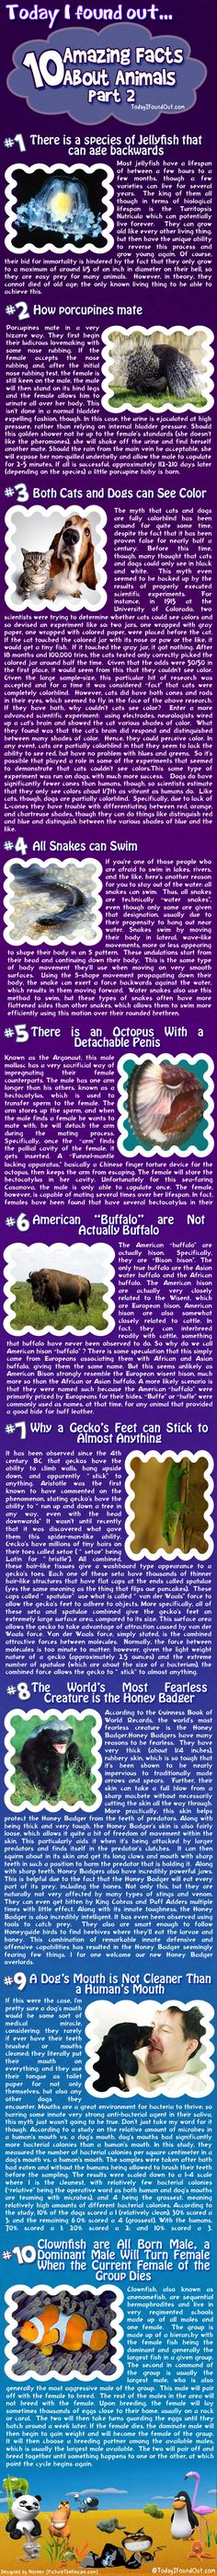 10 Amazing Animal Facts: Part 2